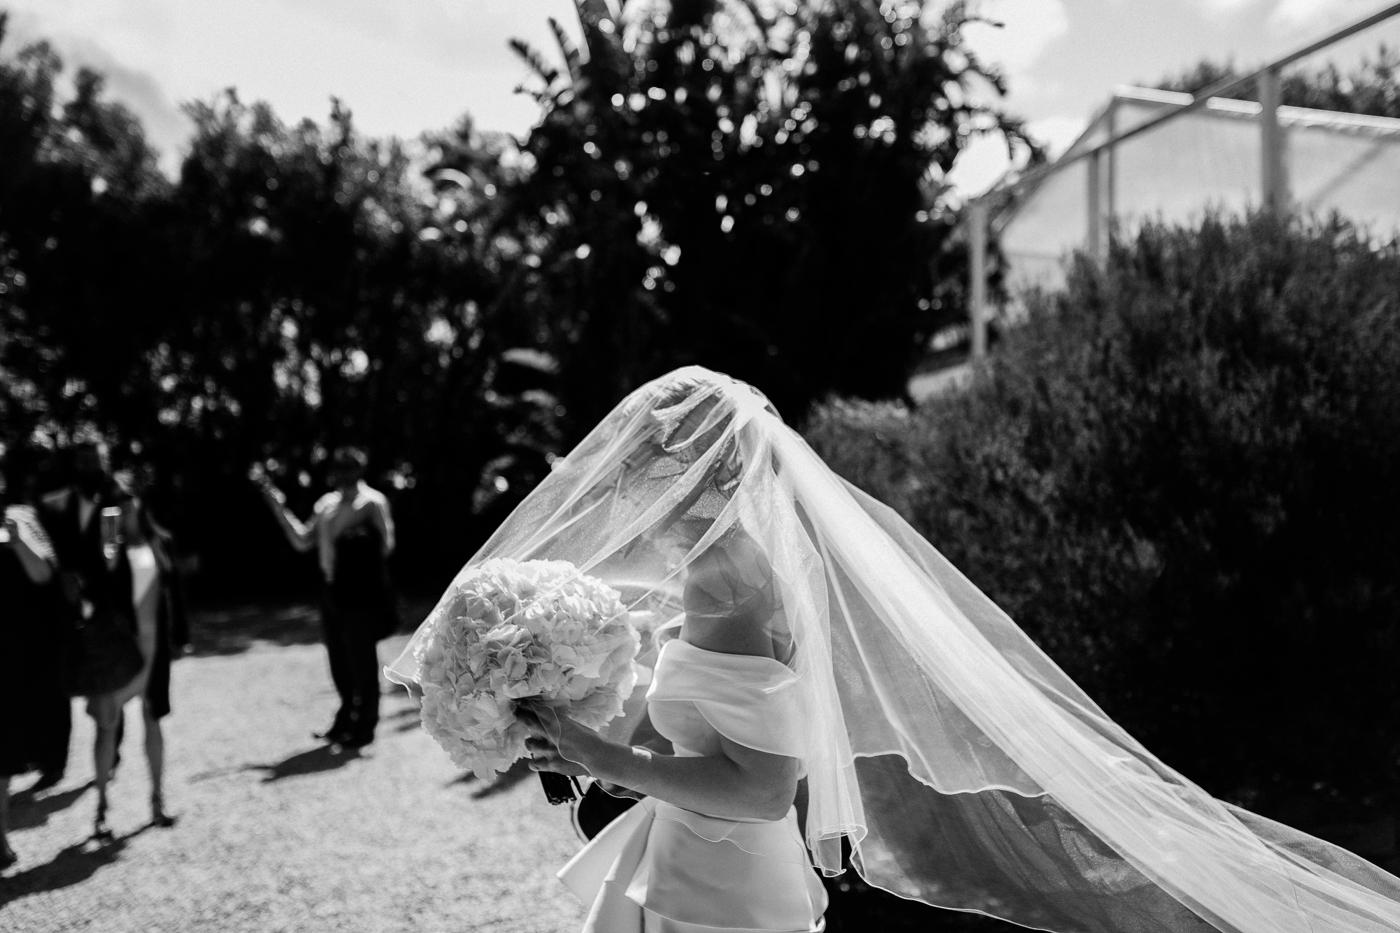 Bec & Brad - Waverley Estate Wedding - Natural Wedding Photographer in Adelaide - www.katherineschultzphotography.com 31